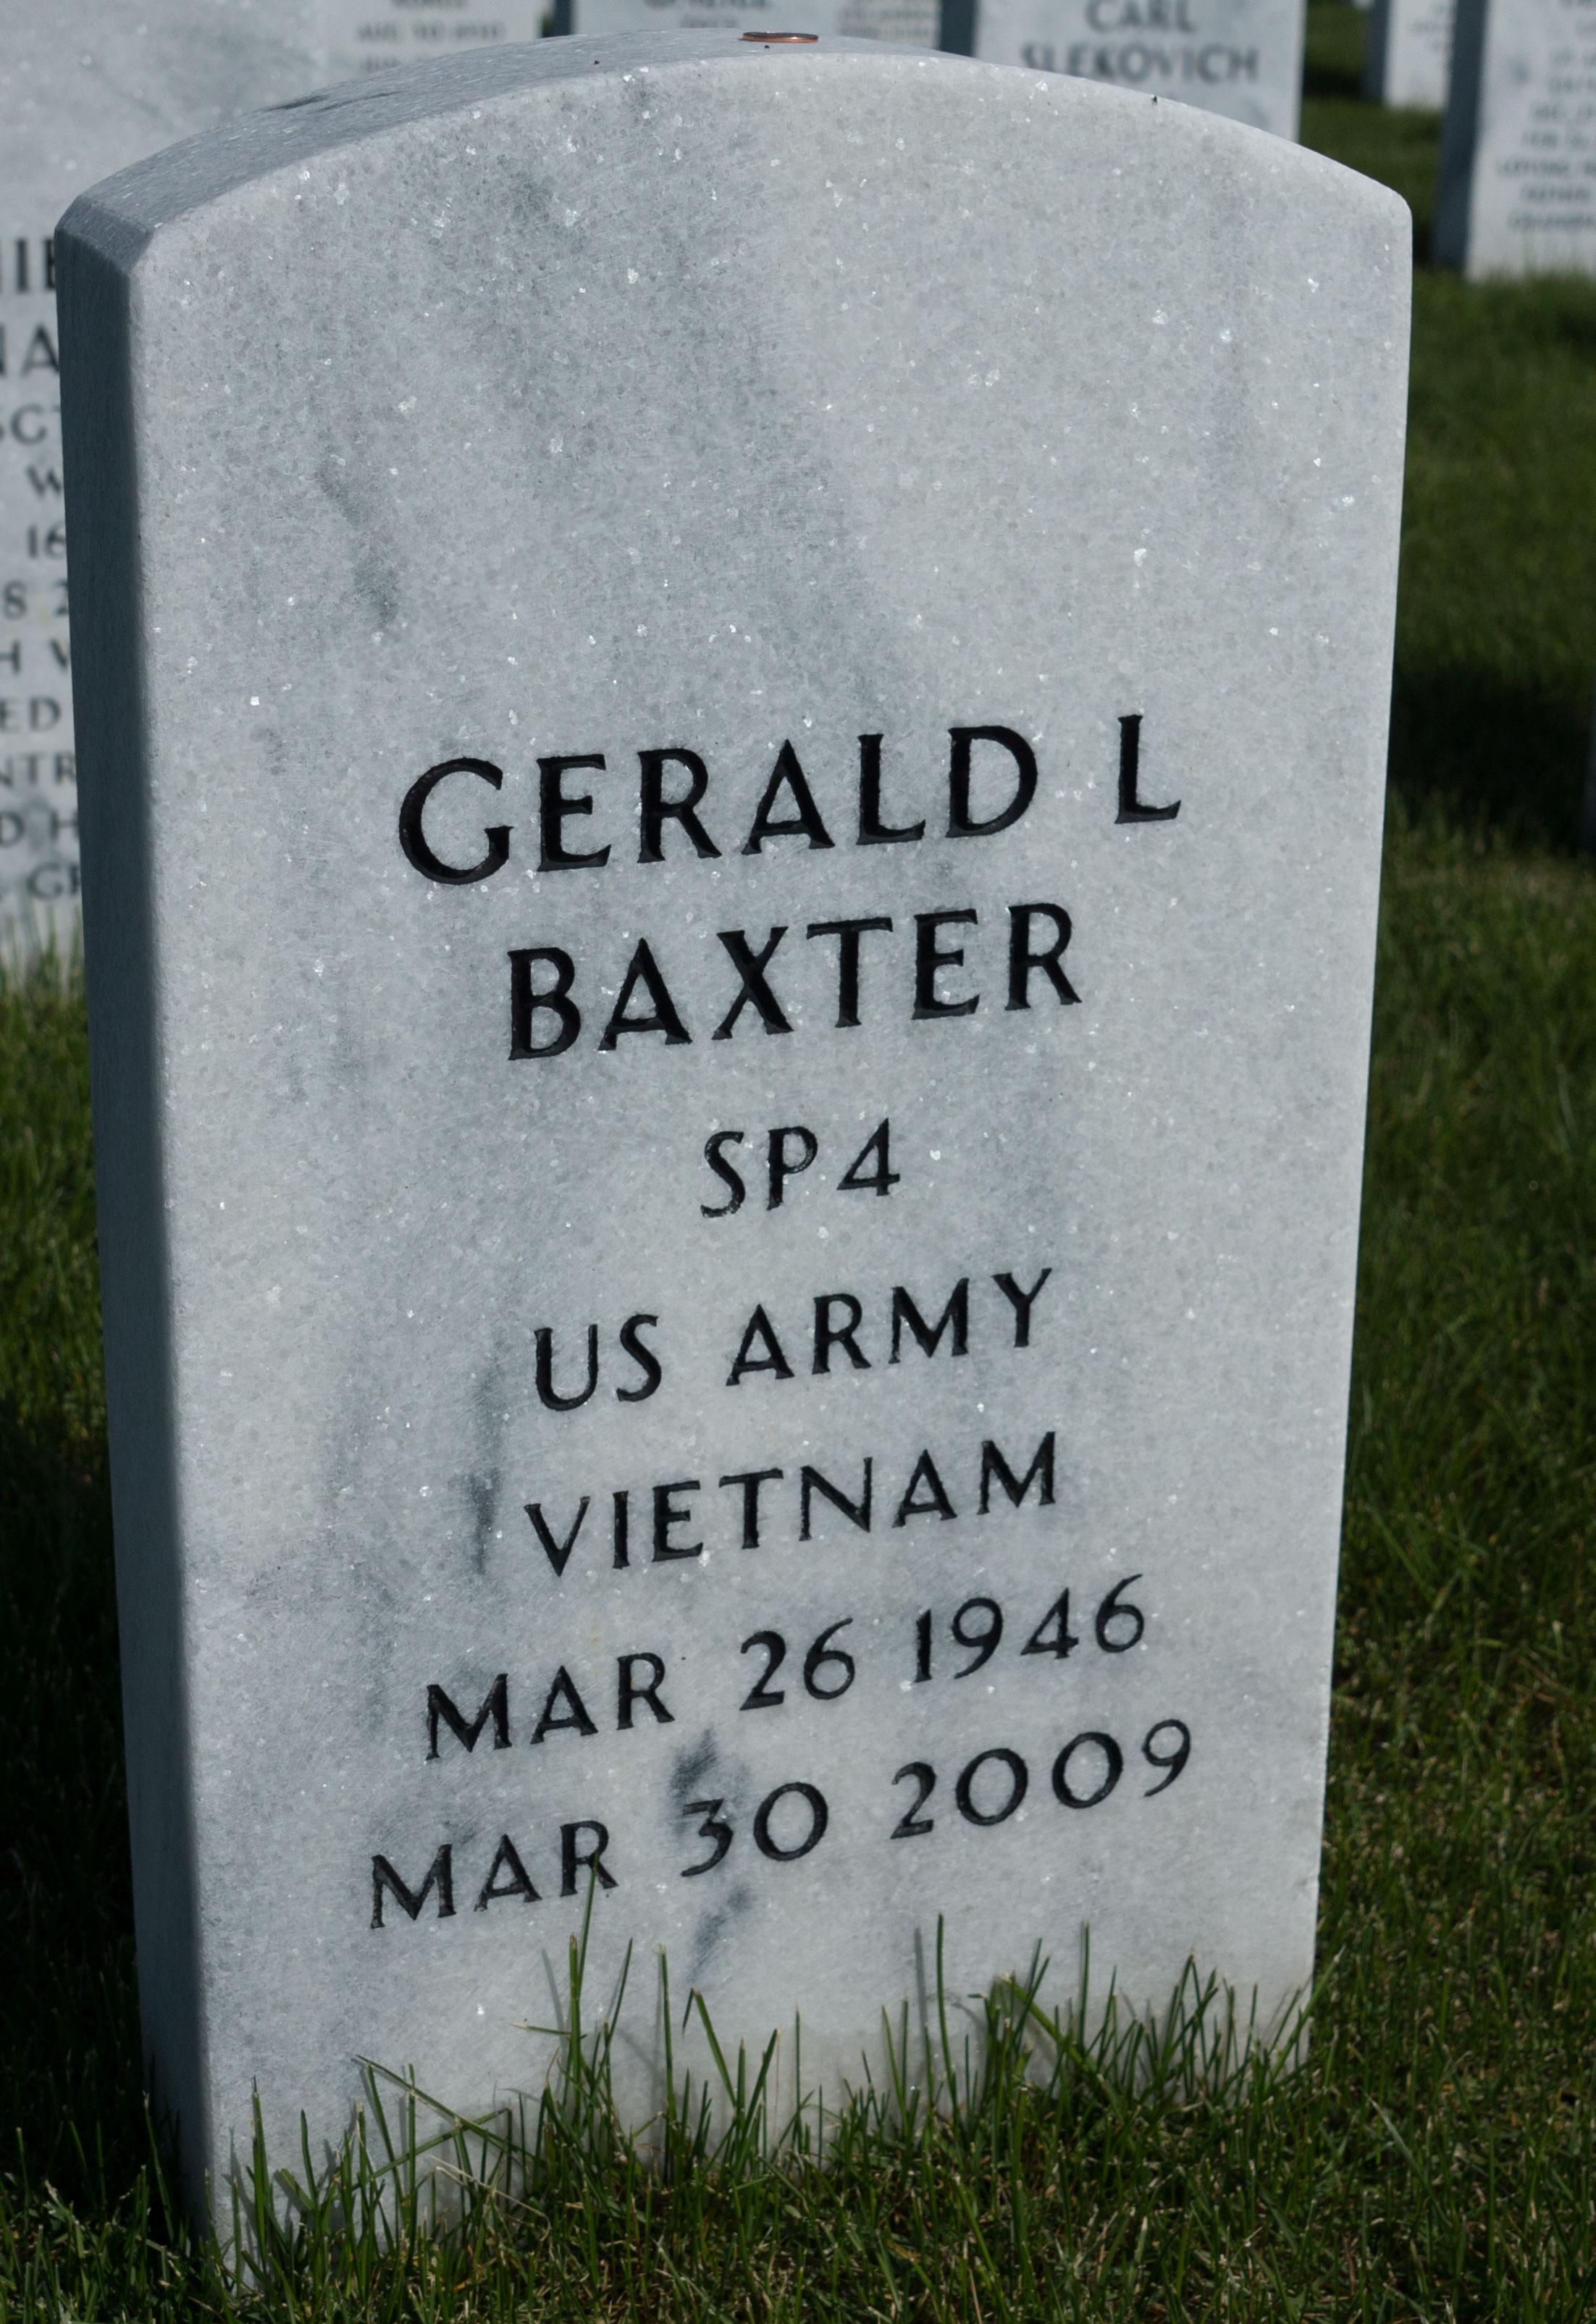 Gerald Lee Baxter